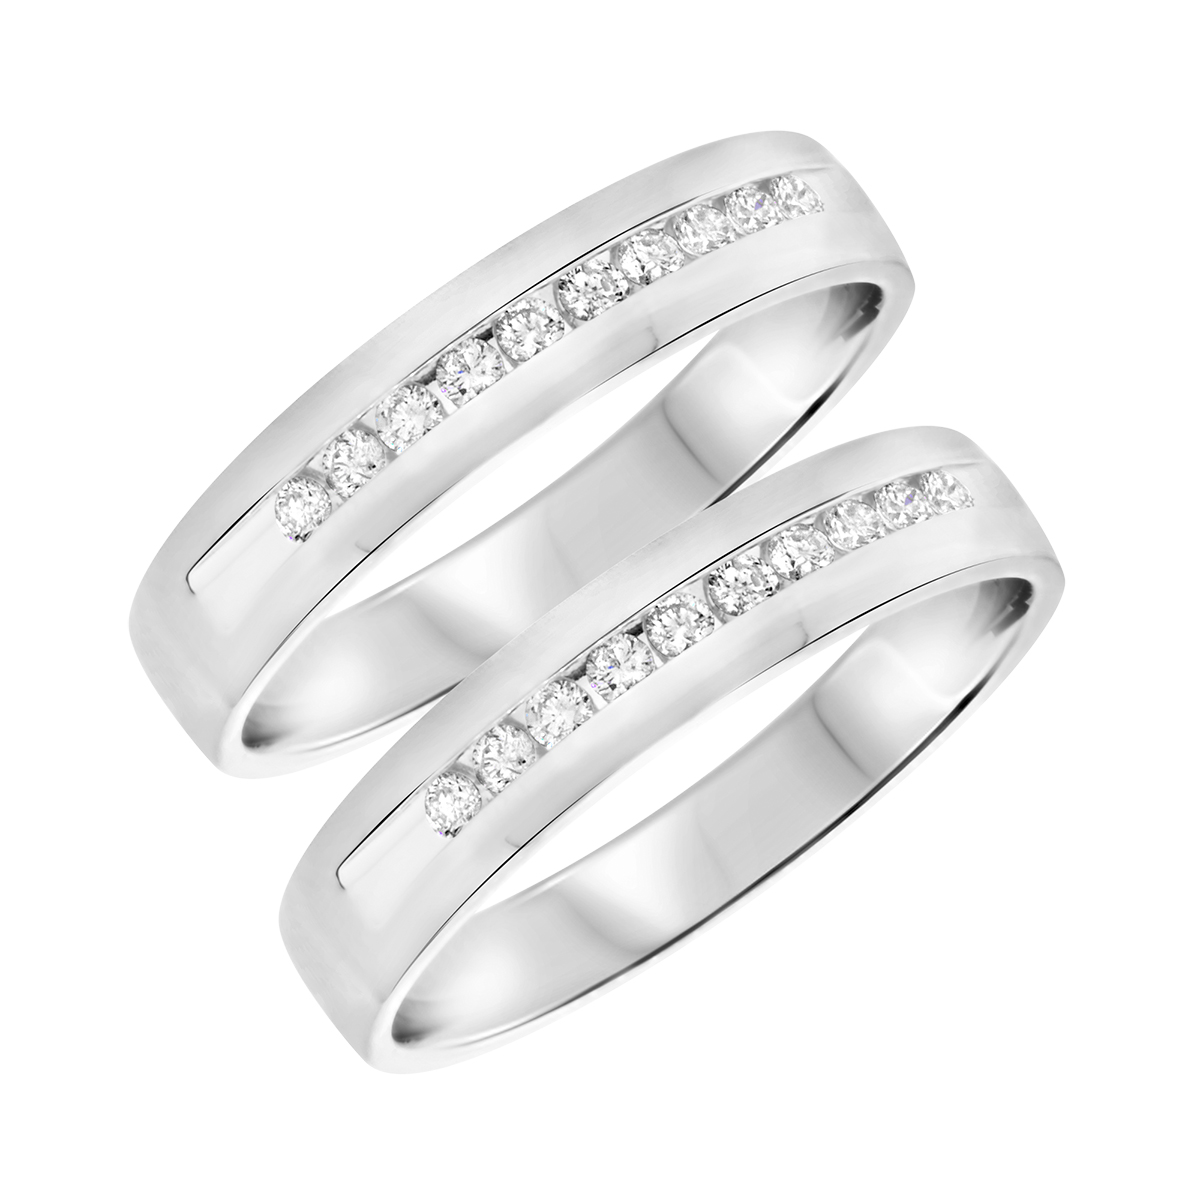 1/2 CT. T.W. Round Cut Mens  Same Sex Wedding Band Set 14K White Gold- Size 8